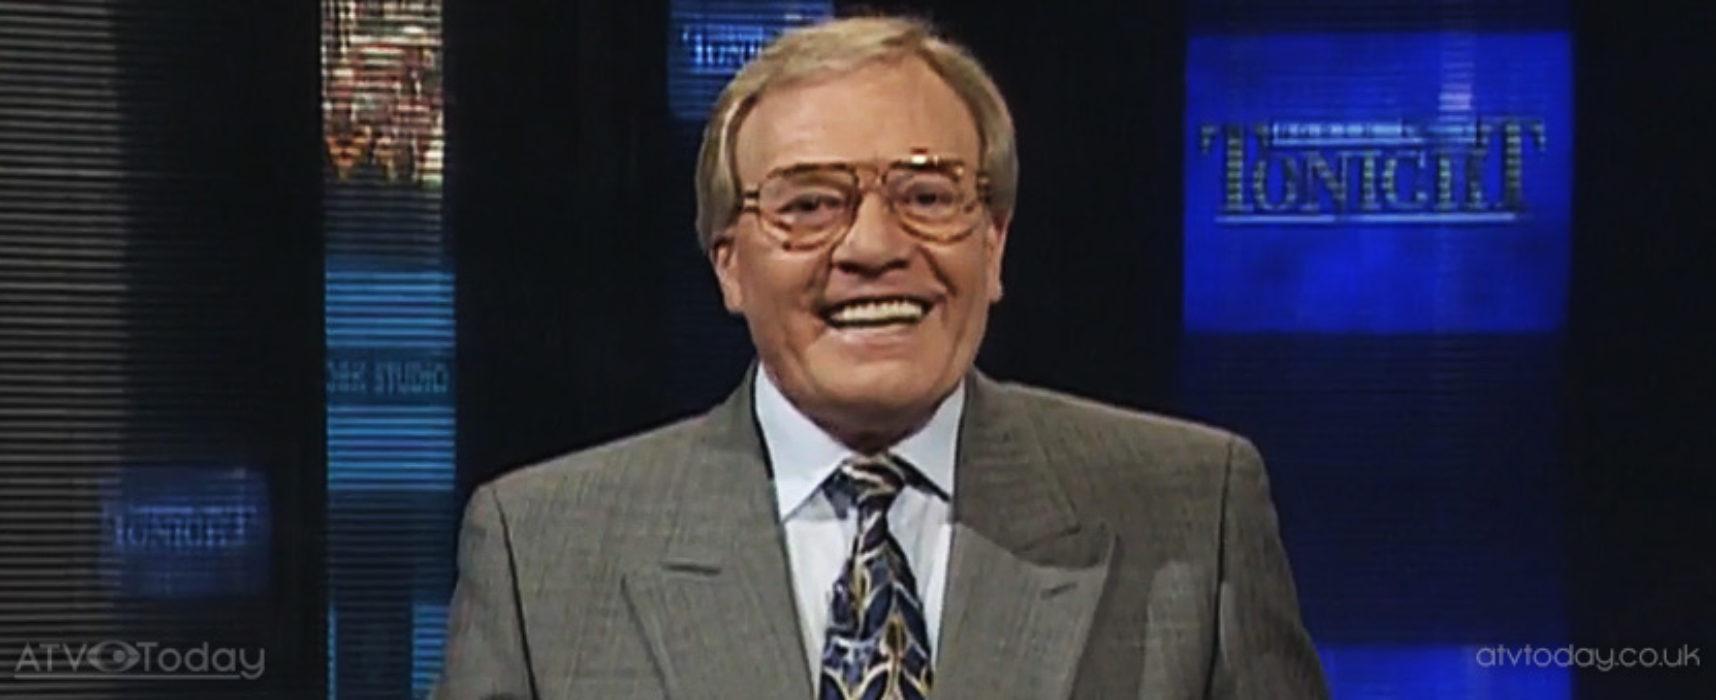 ITV and BBC presenter Mike Neville dies